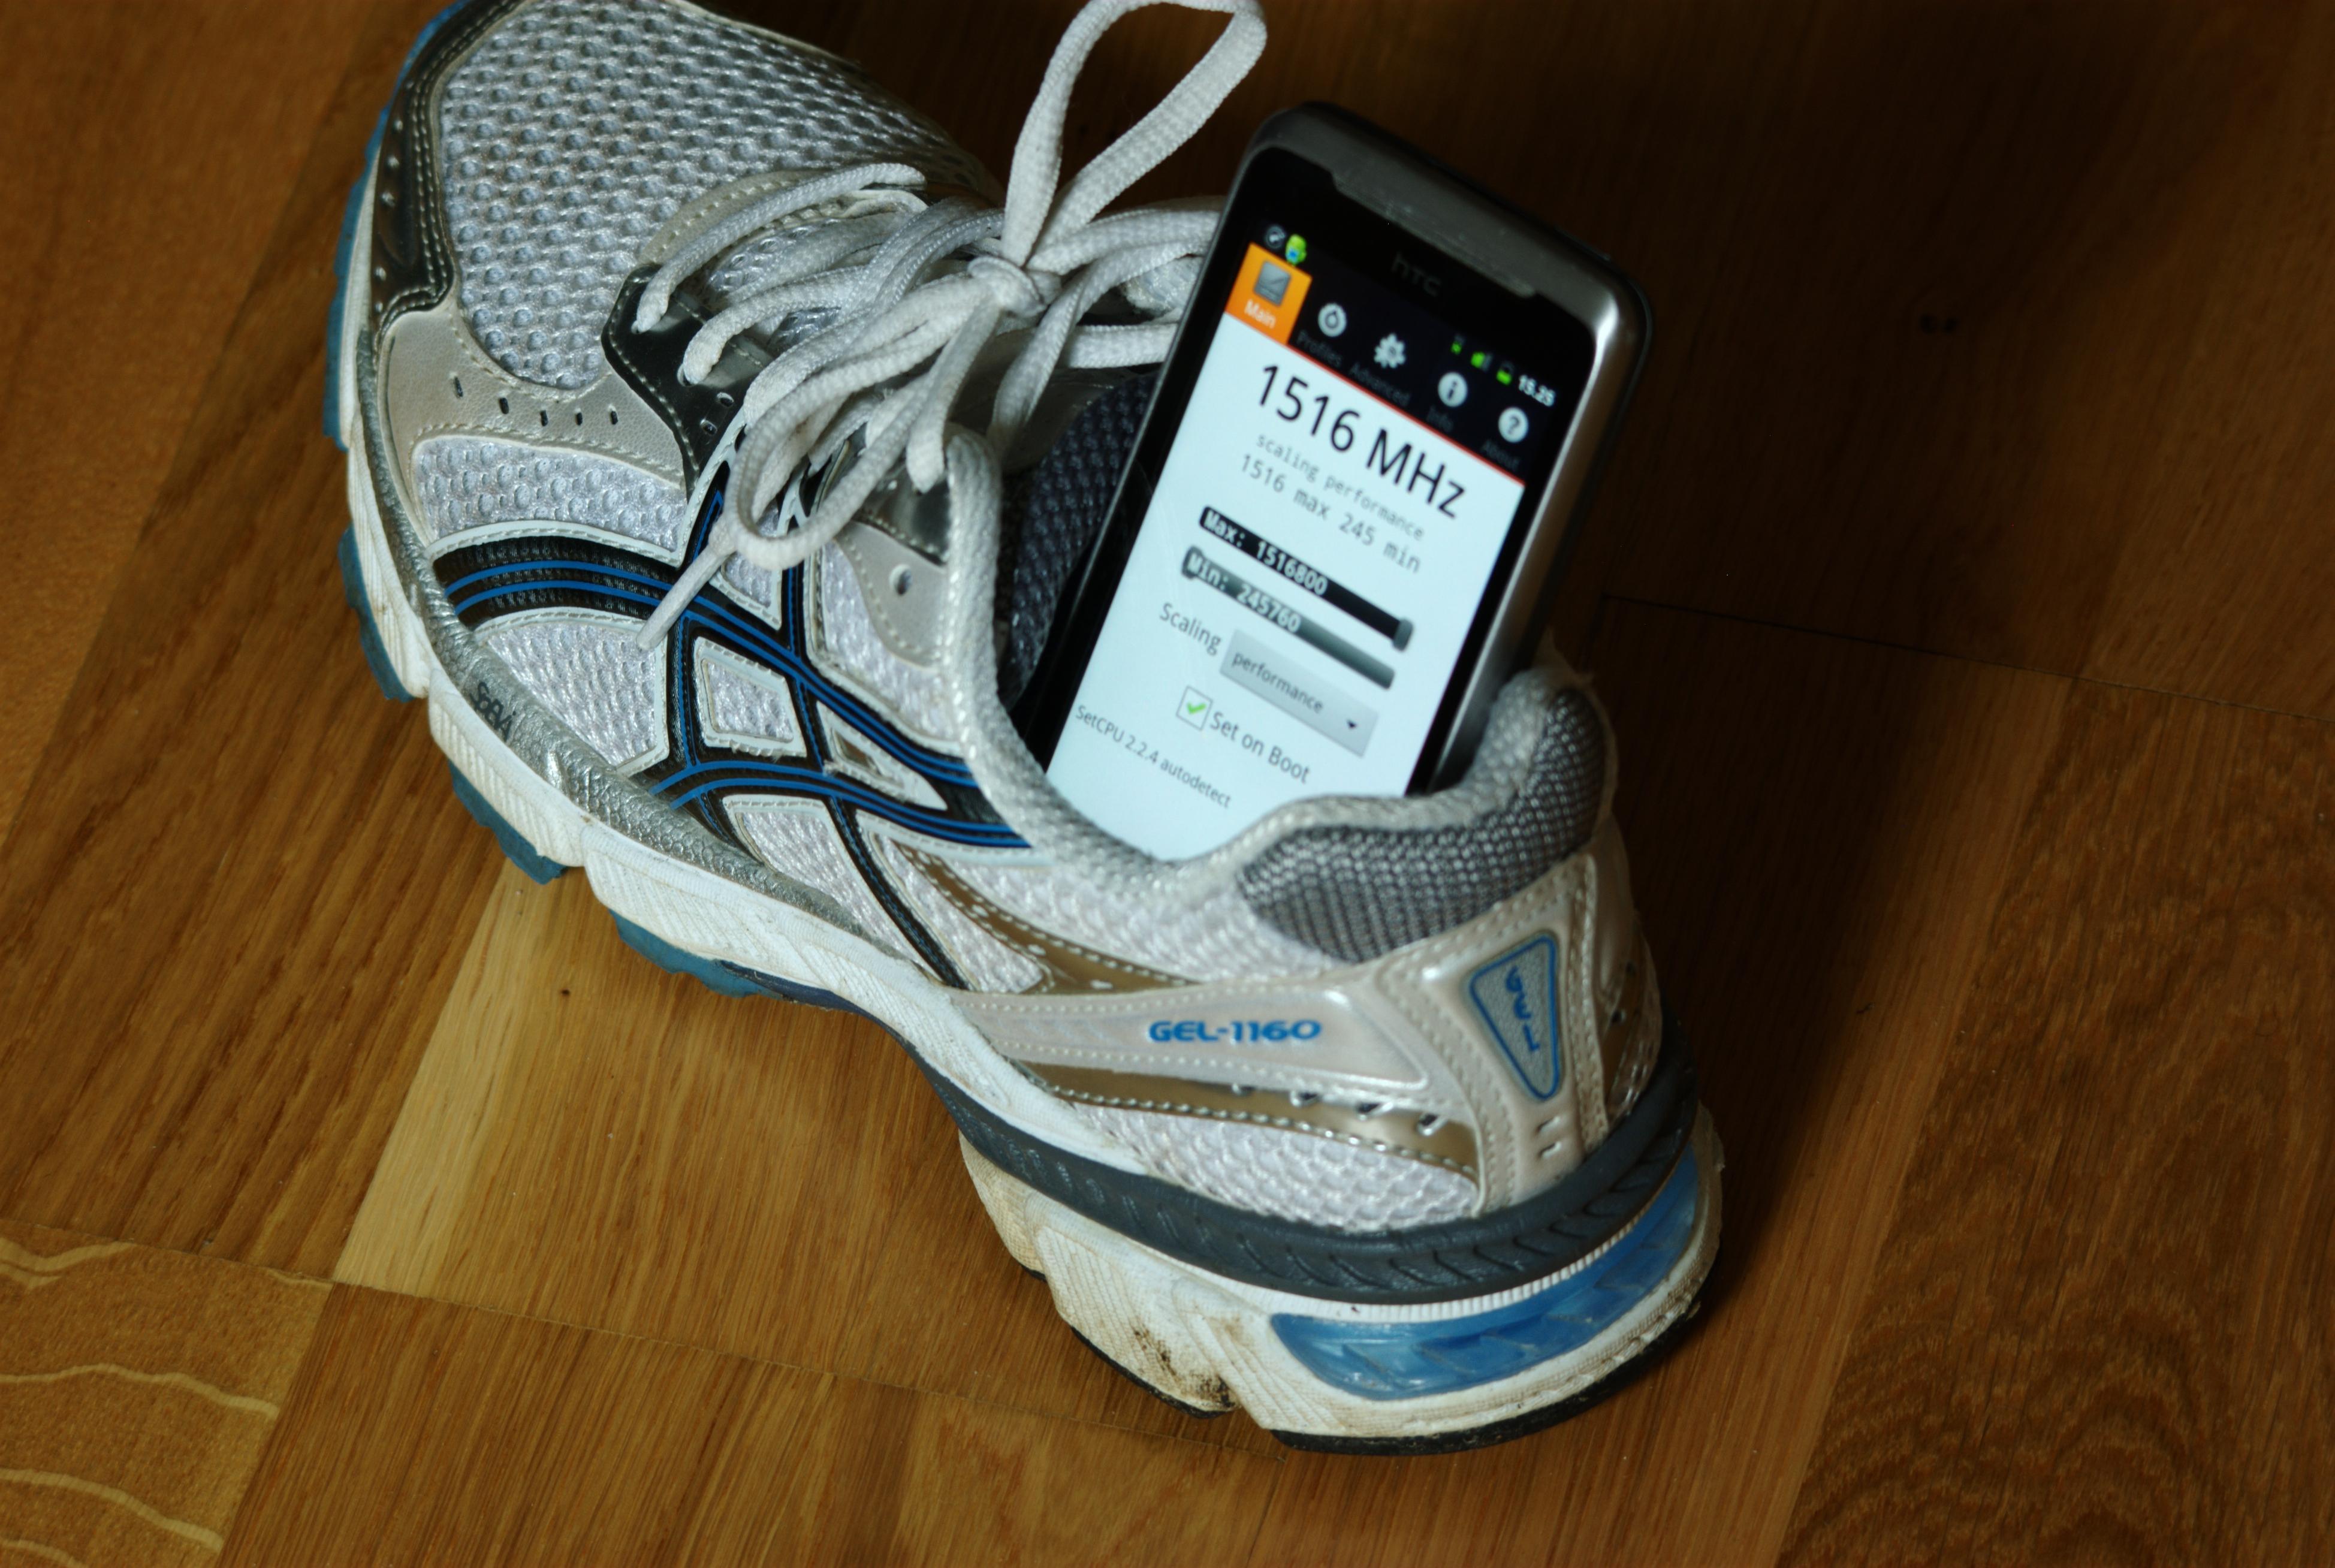 Selv en god, gammel HTC Desire Z kan kjøre på over 1500 MHz. (Foto: Einar Eriksen).